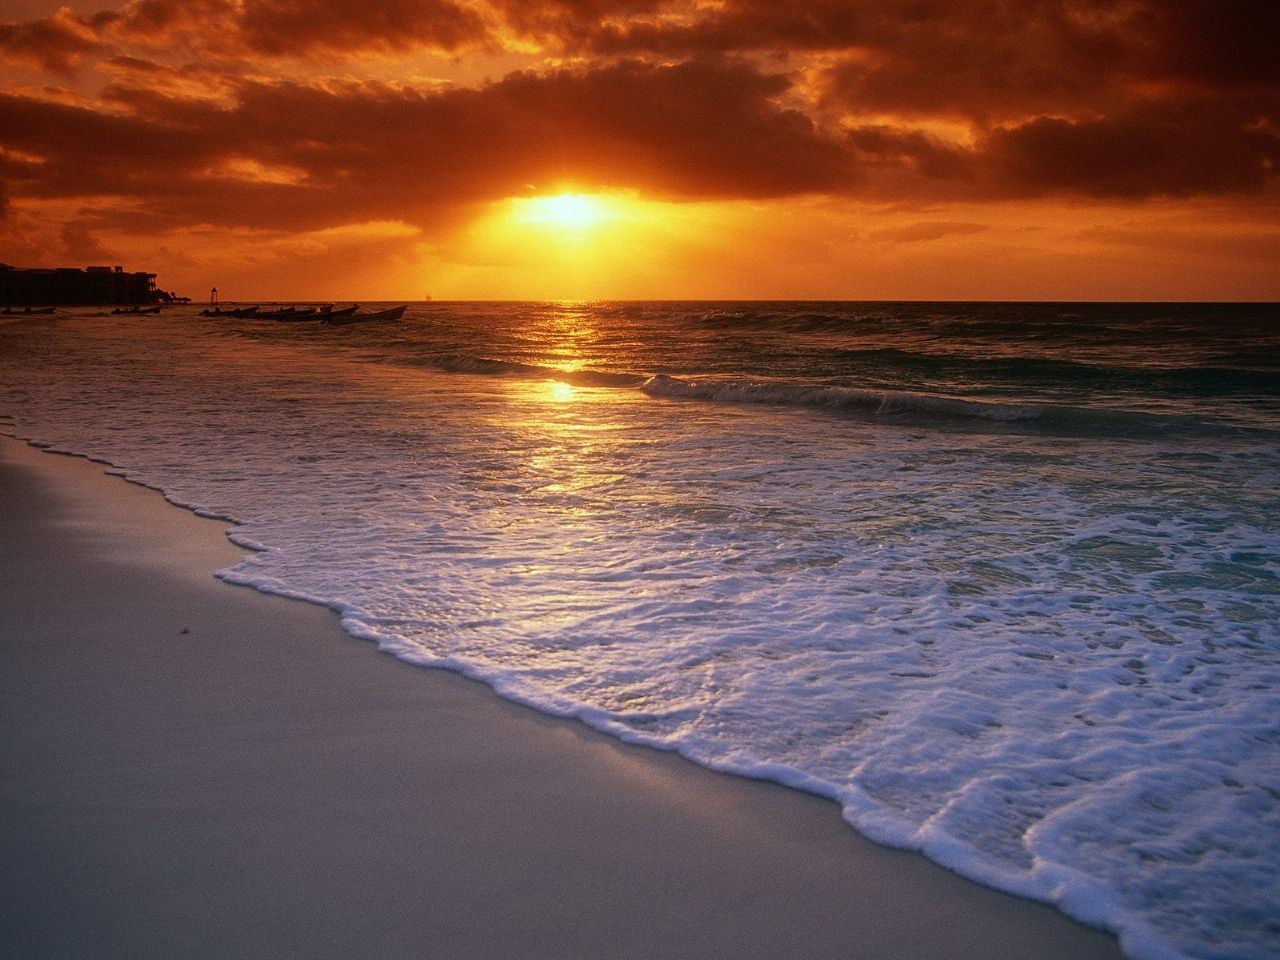 Sunset wallpapers desktop wallpapers - Playa wallpaper ...